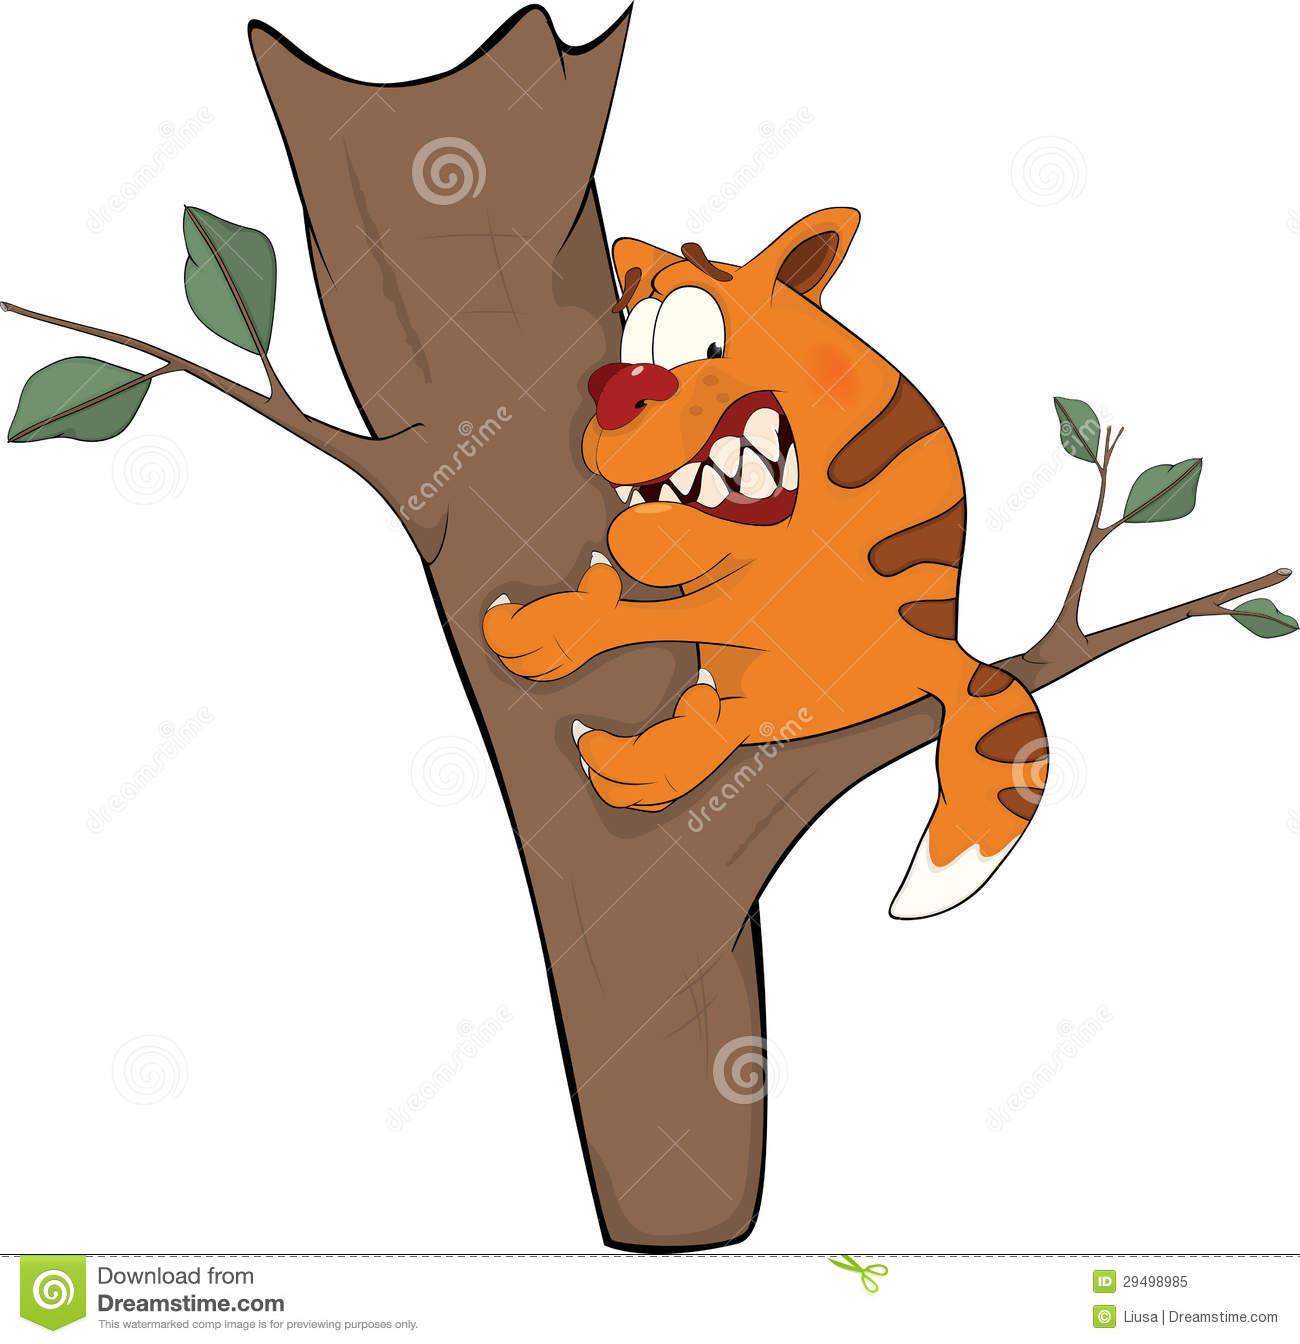 Tree clipart cat #2